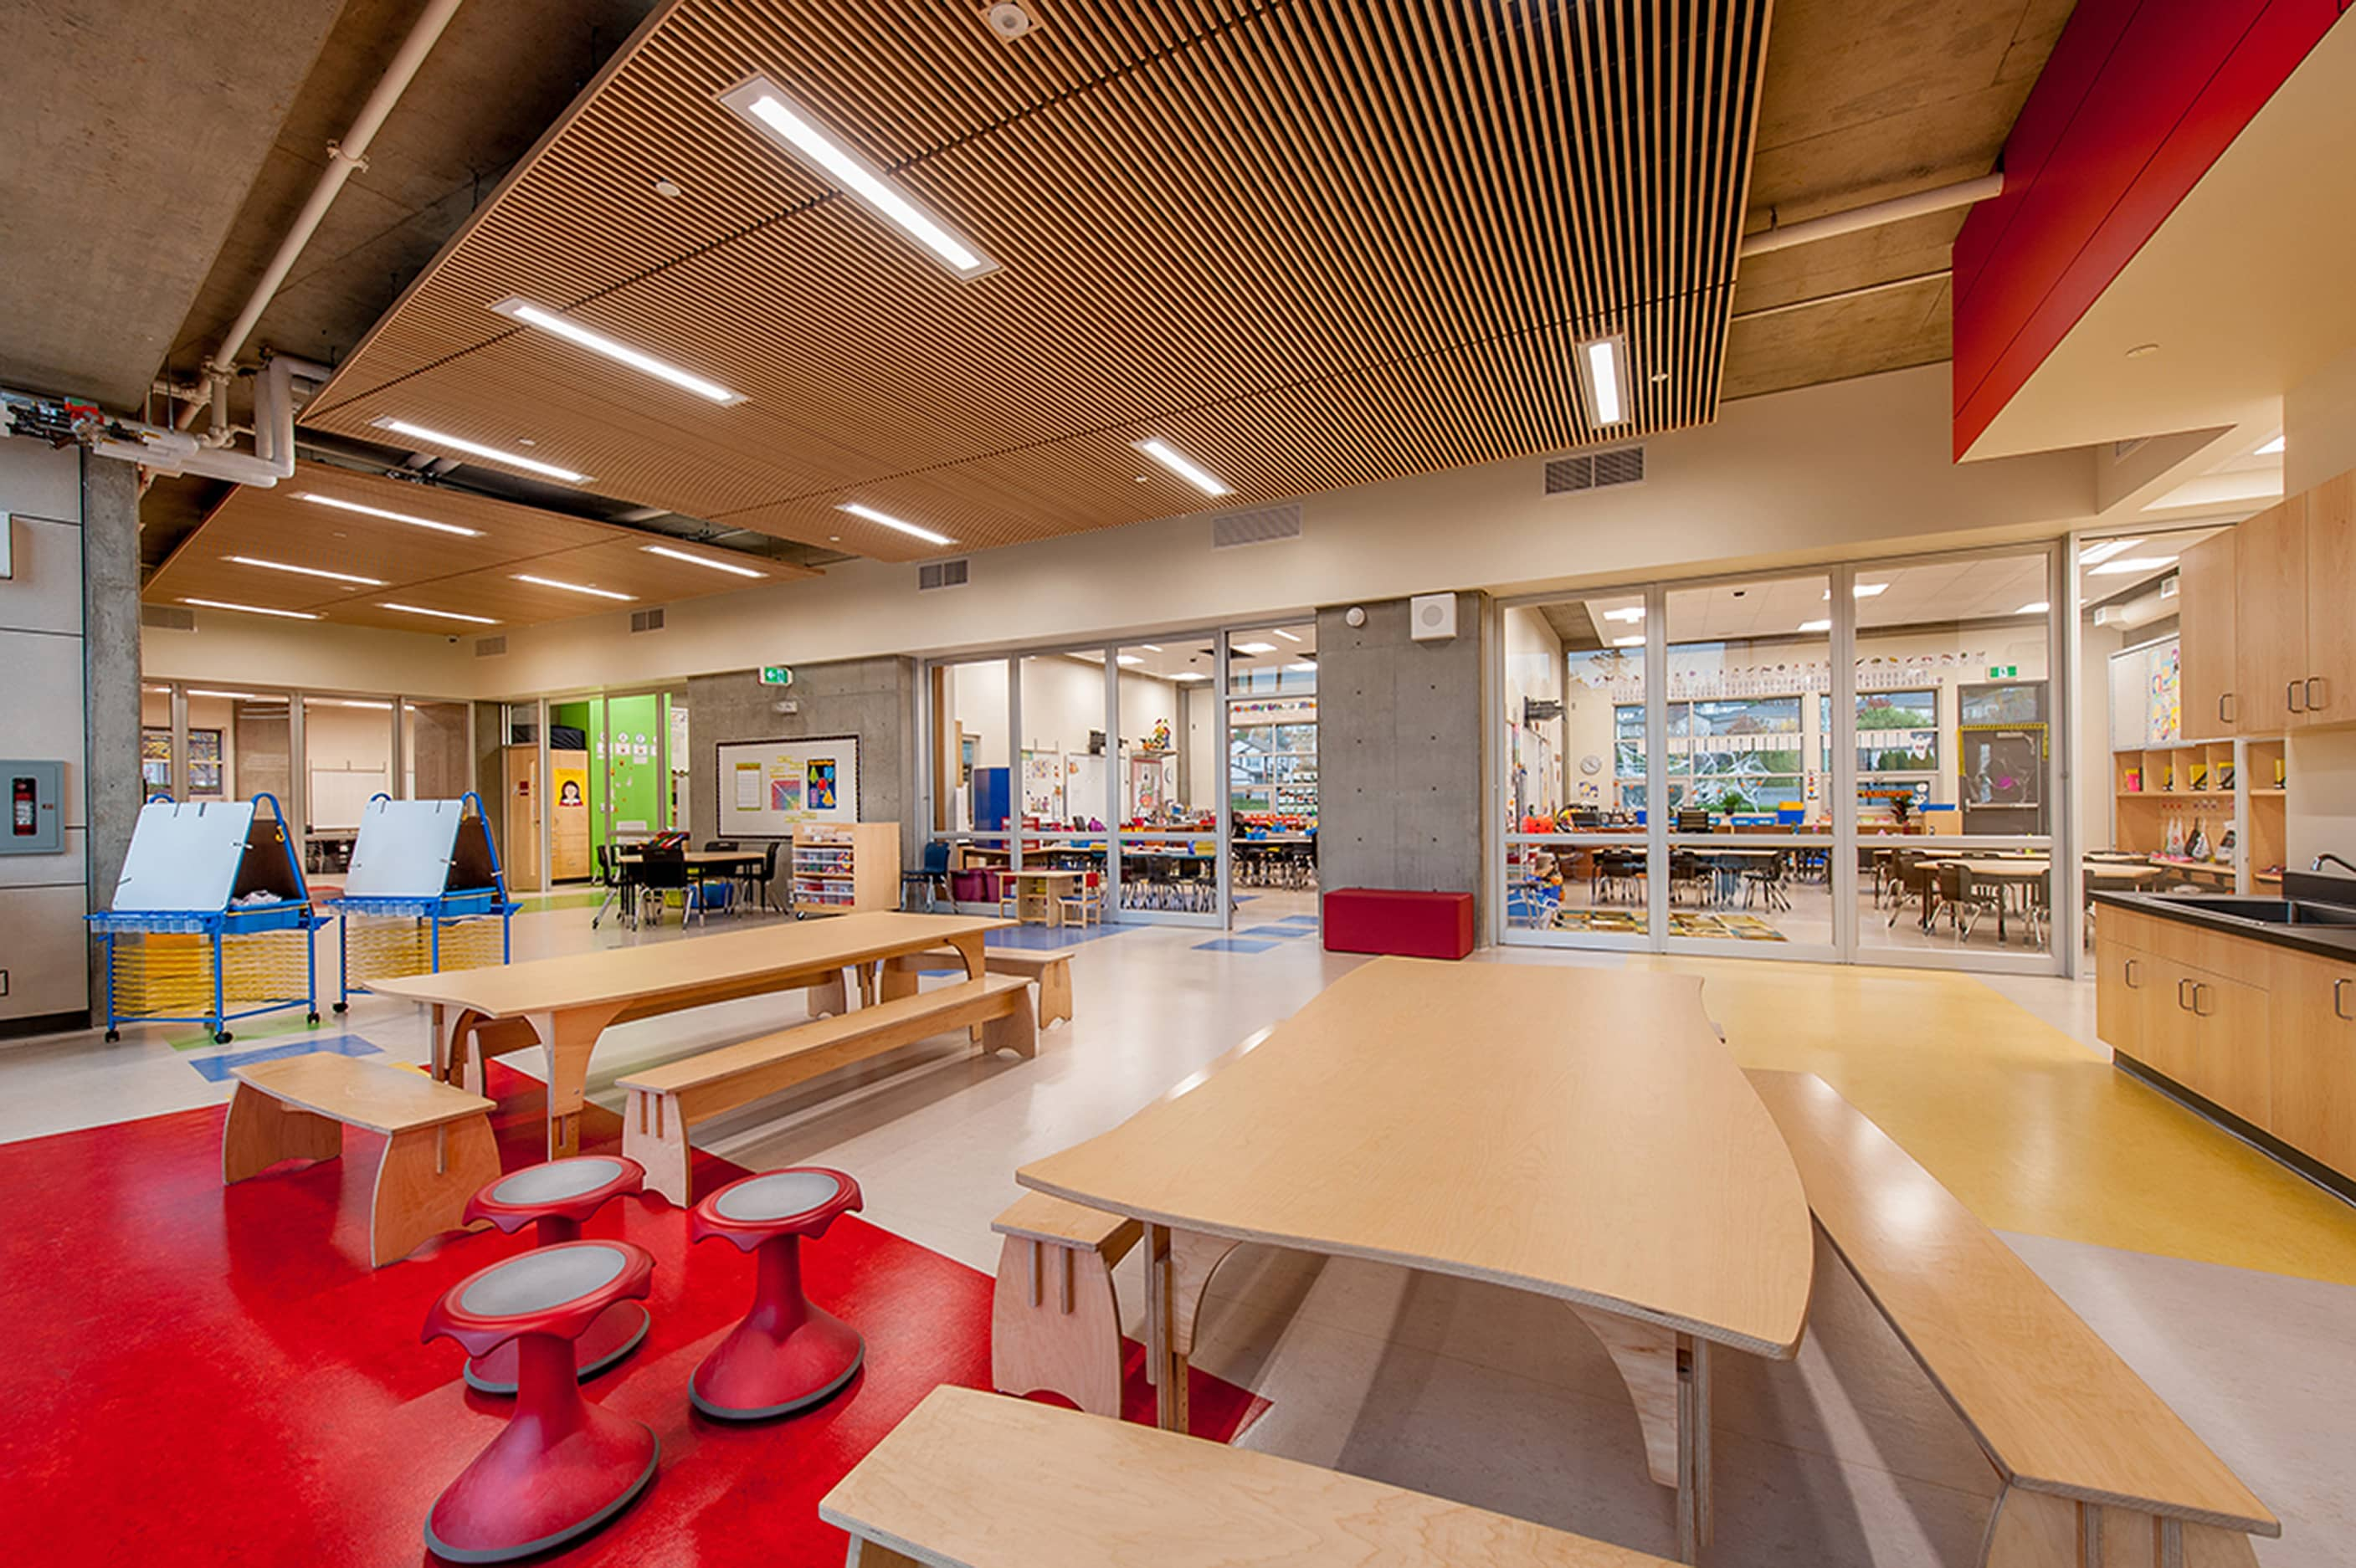 bbp mar jok elementary cafeteria